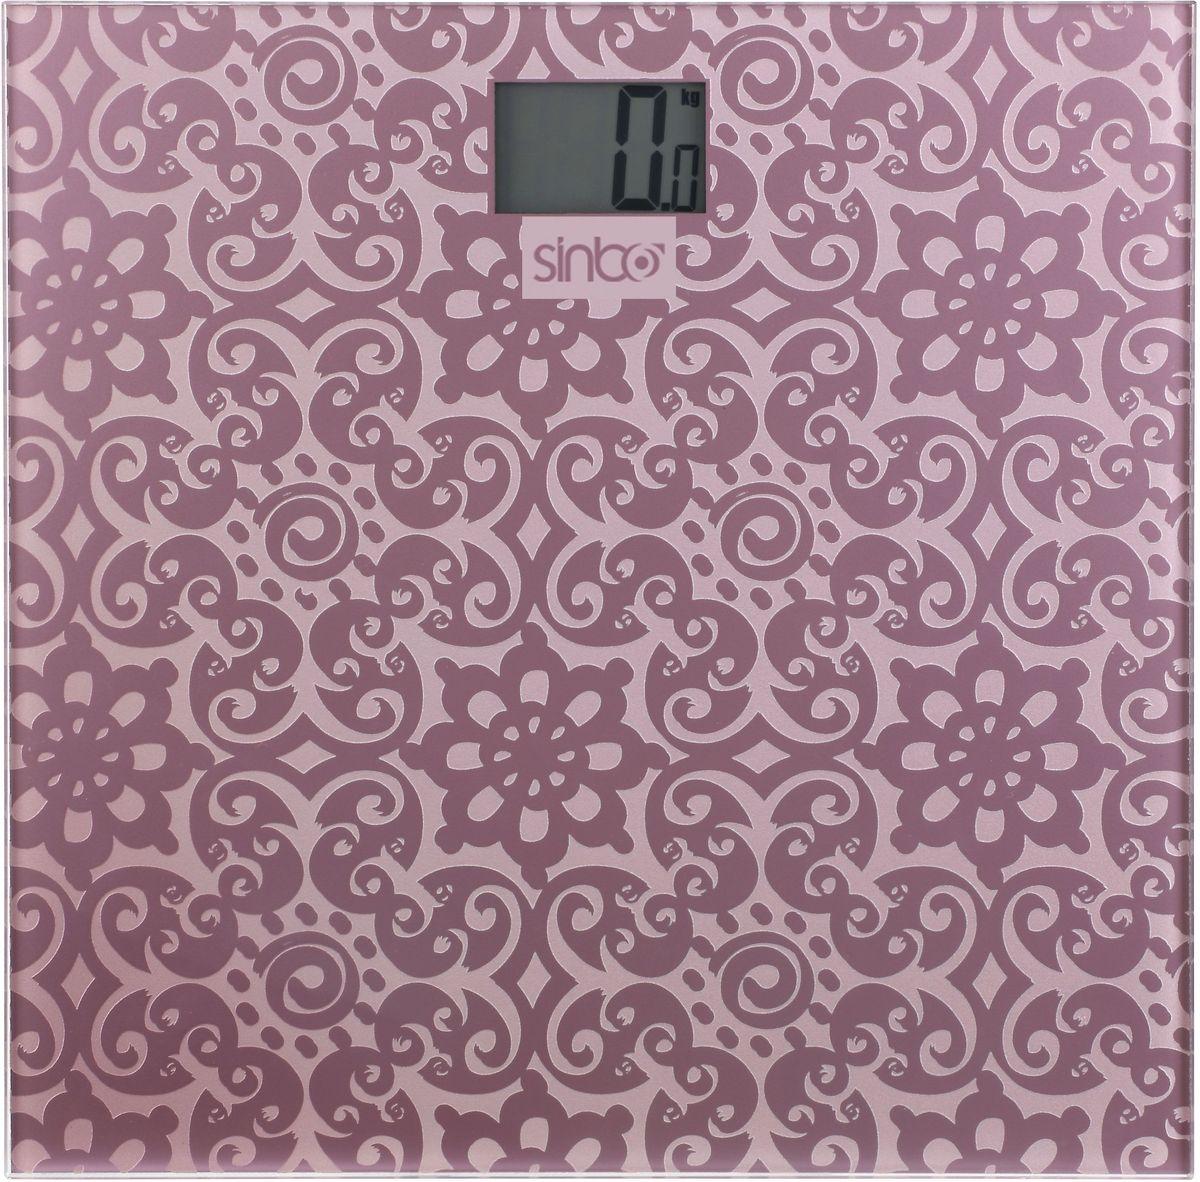 Напольные весы Sinbo SBS 4430, Purple цена